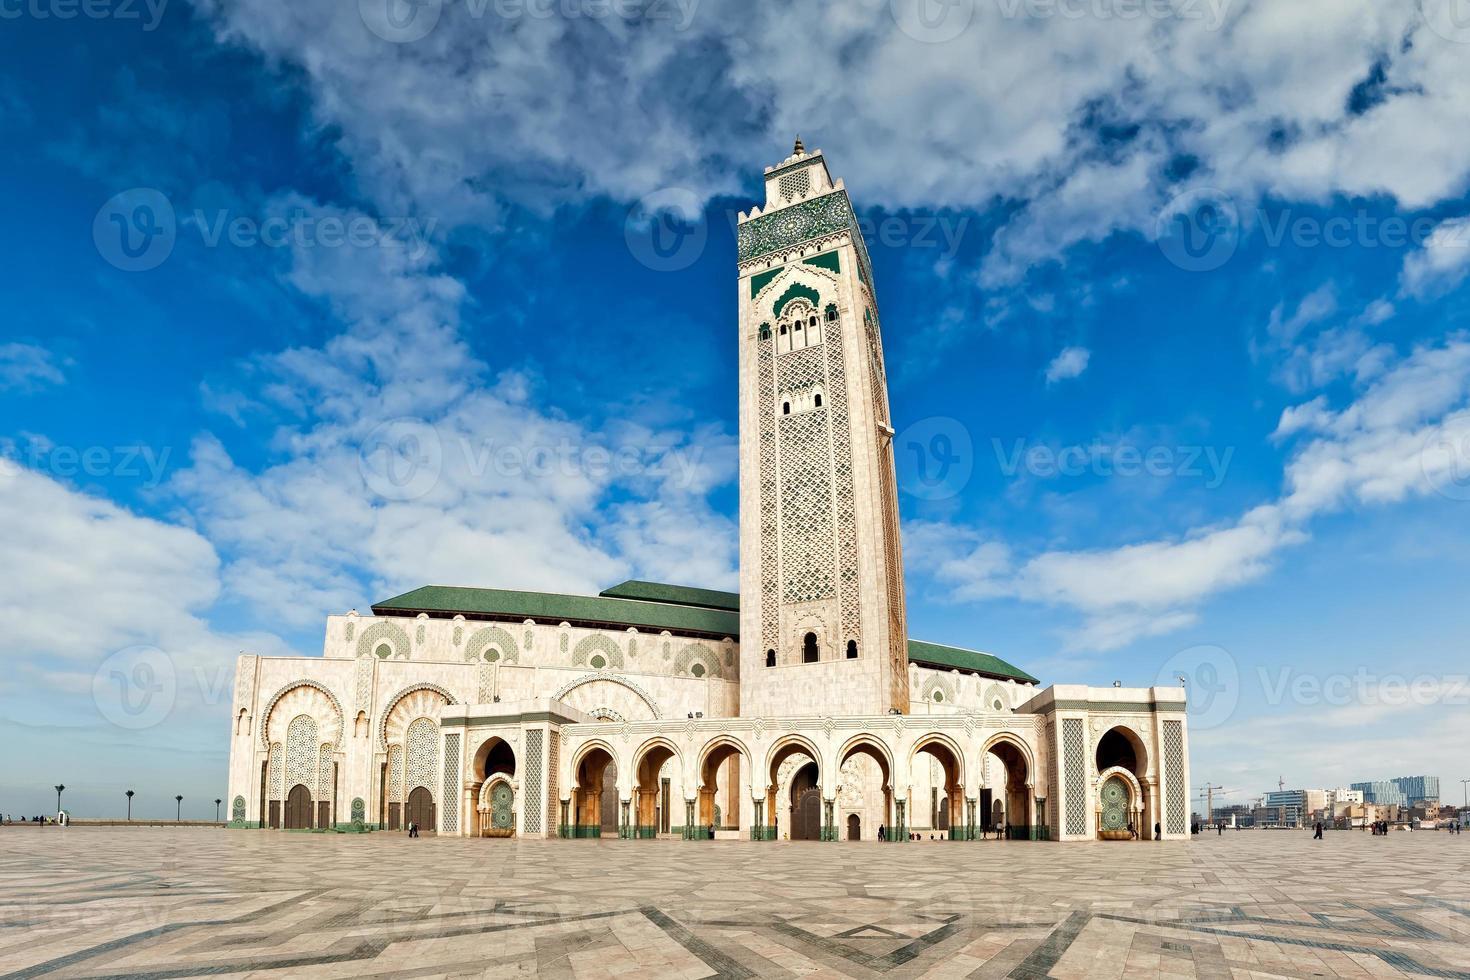 hassan ii-moskee, casablanka, marokko foto